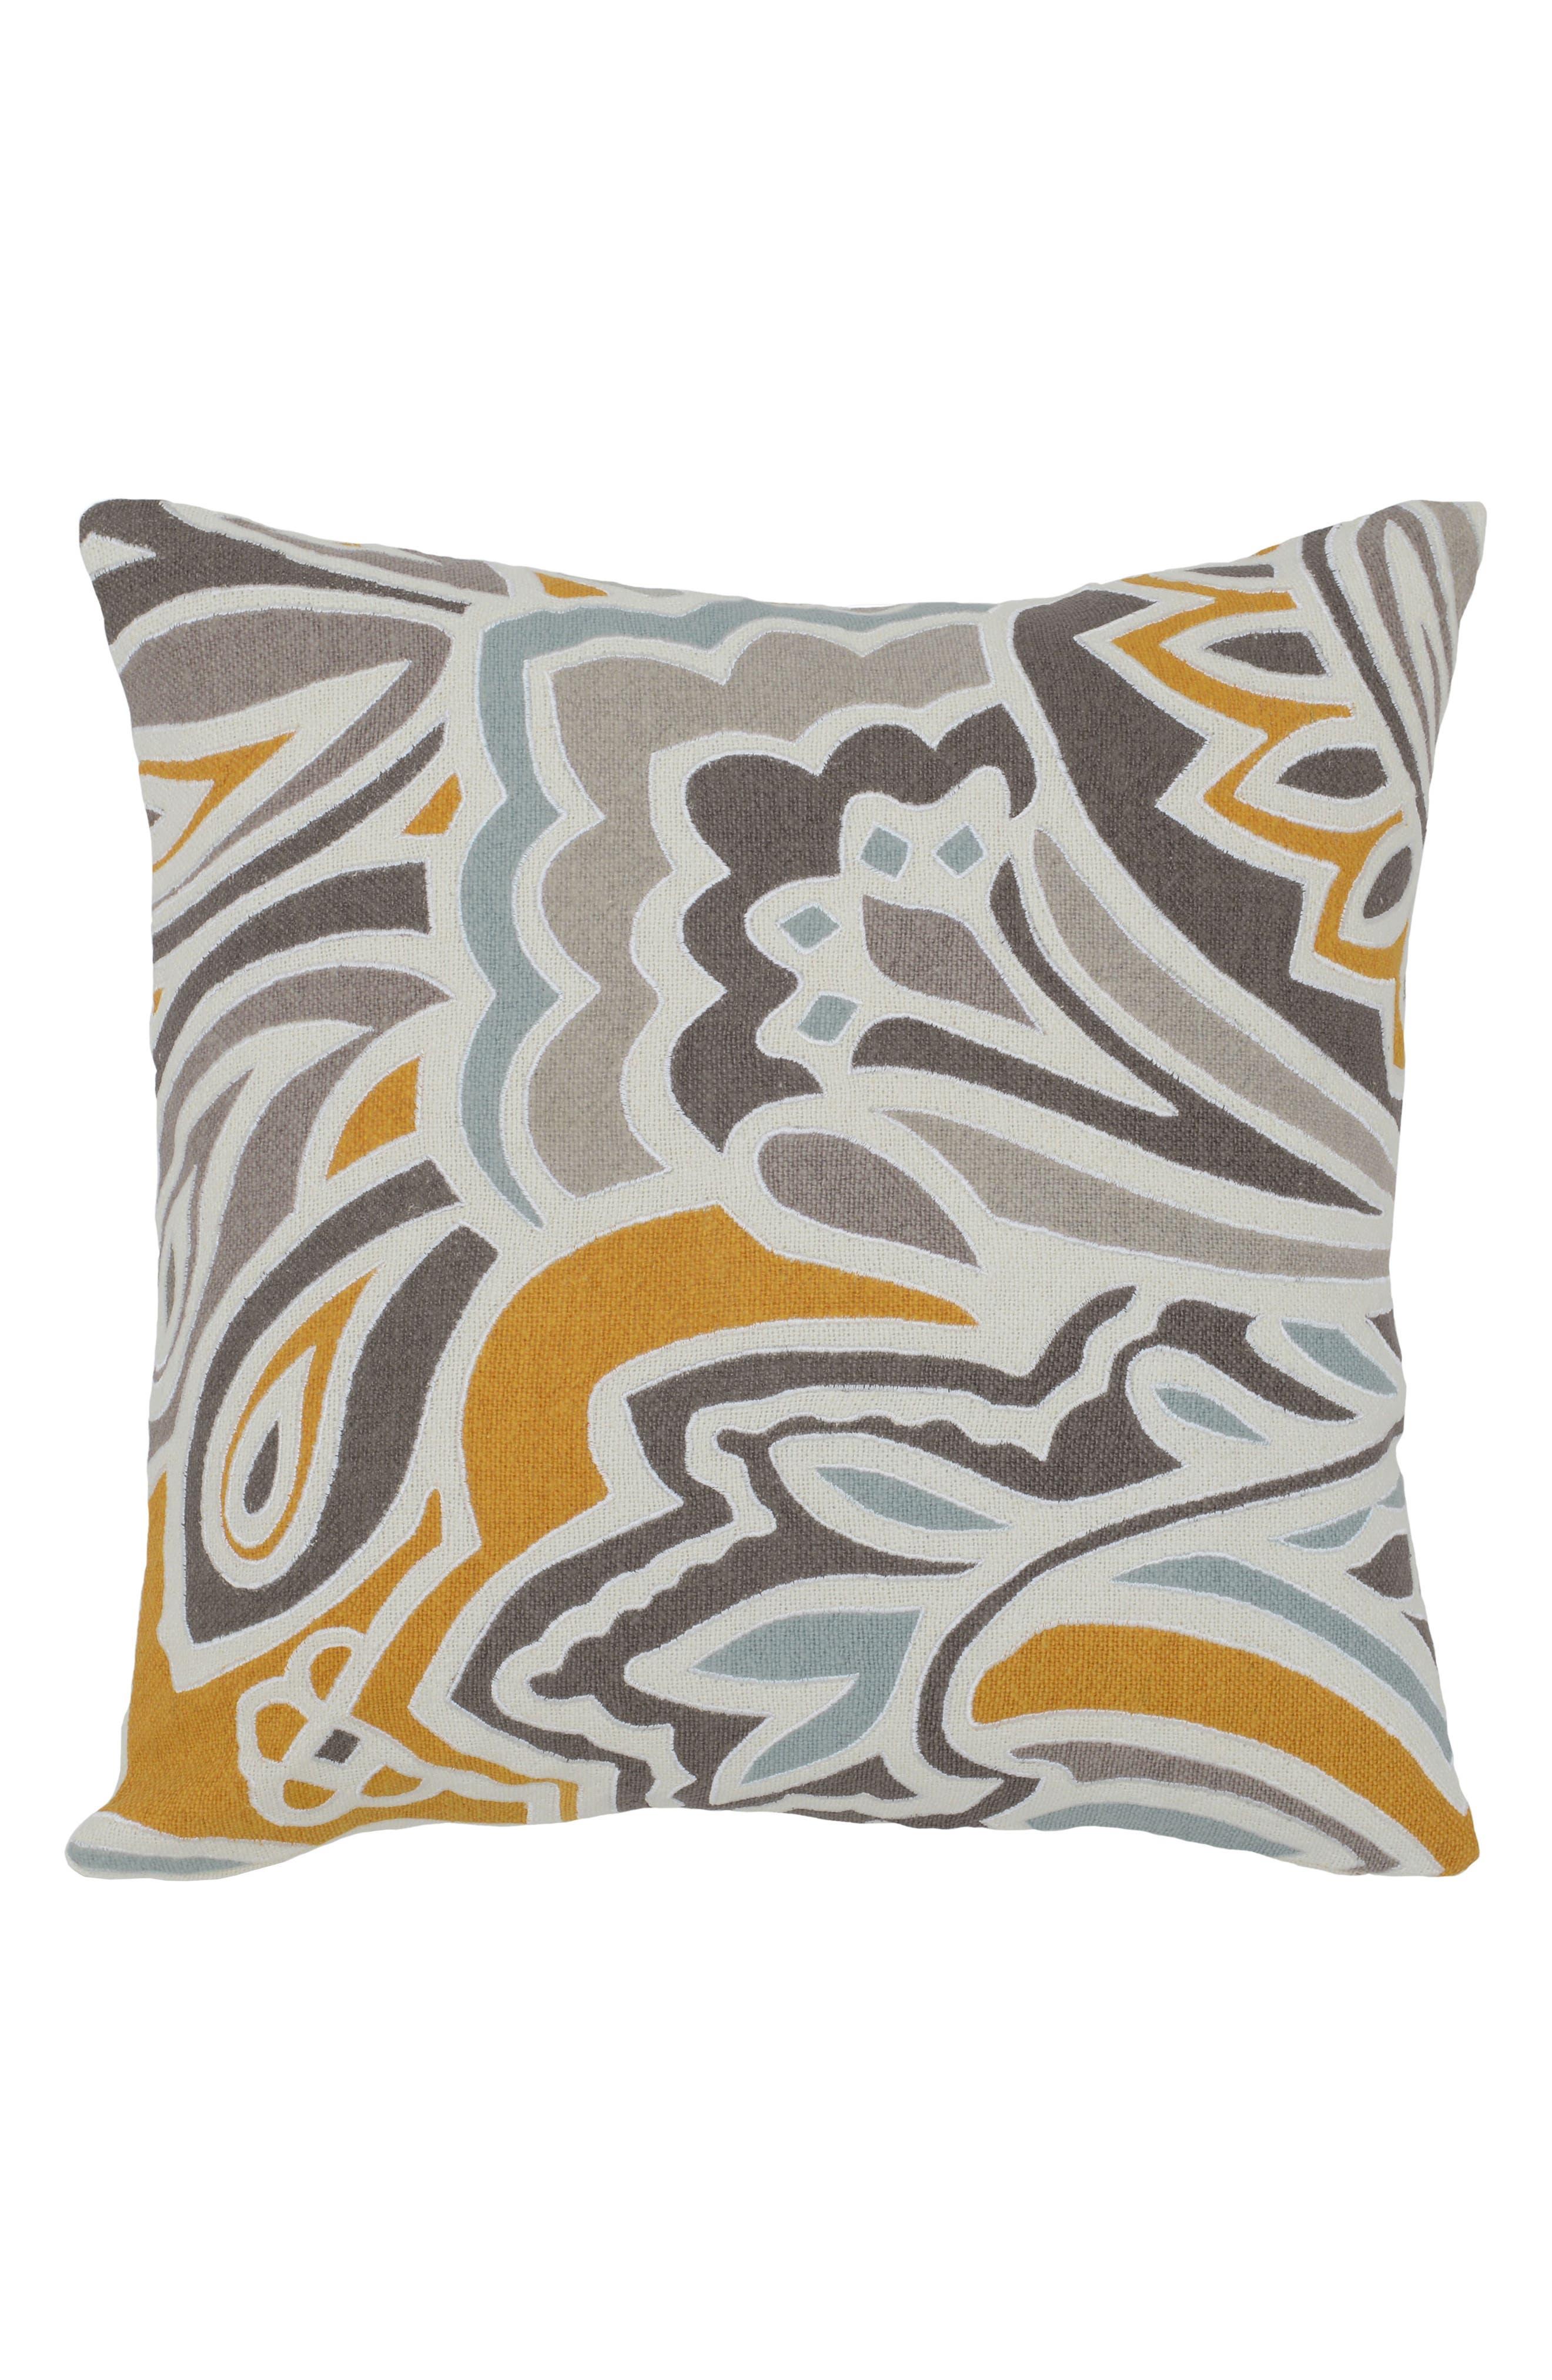 Ve Mindo Pillow,                         Main,                         color, GREY/ YELLOW